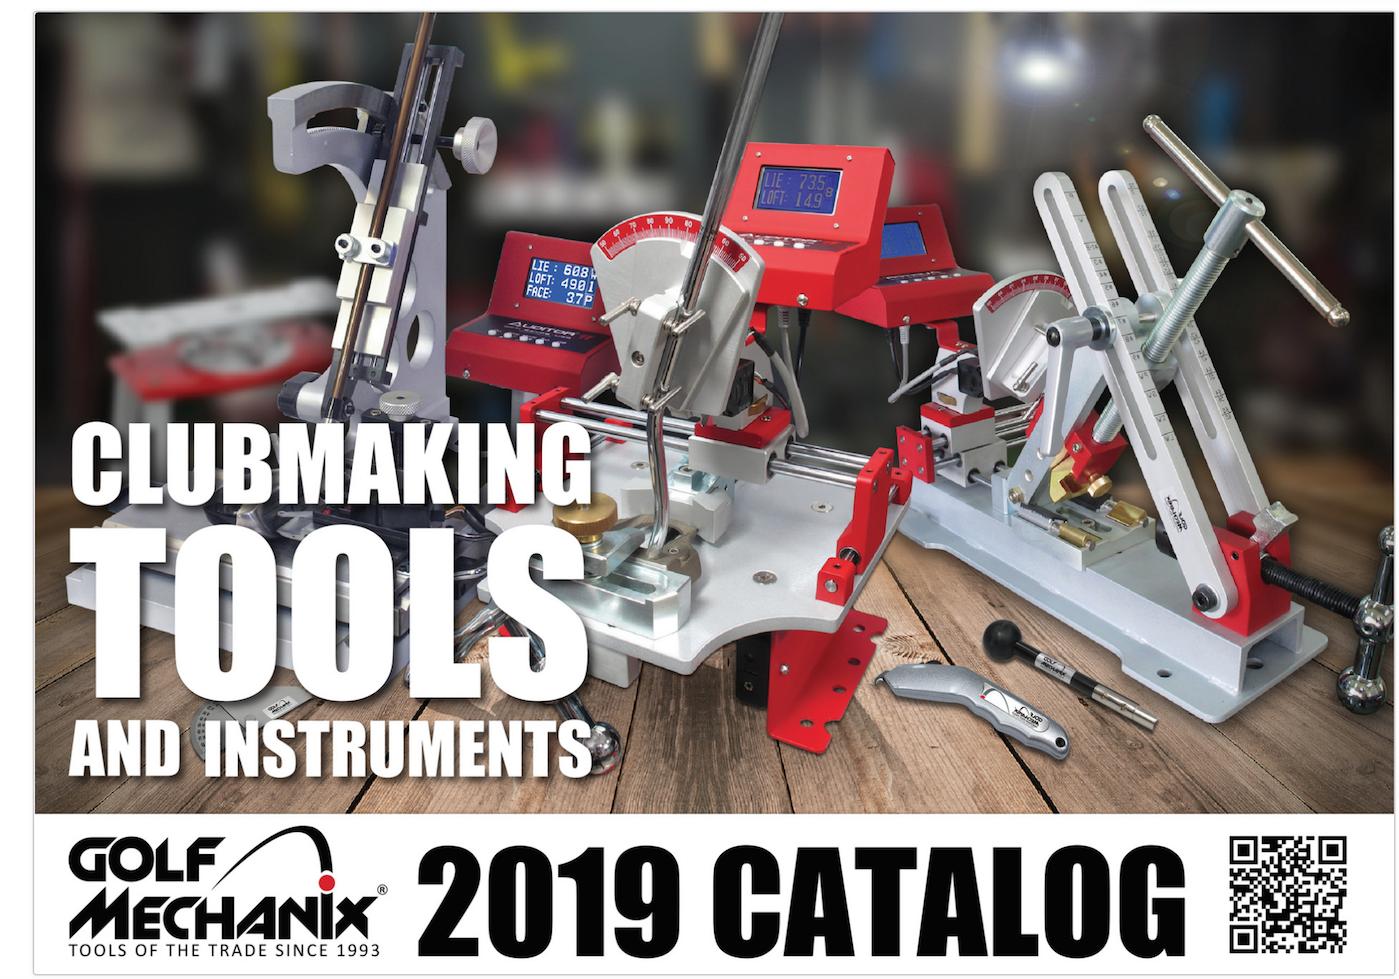 GMX Katalog 2019